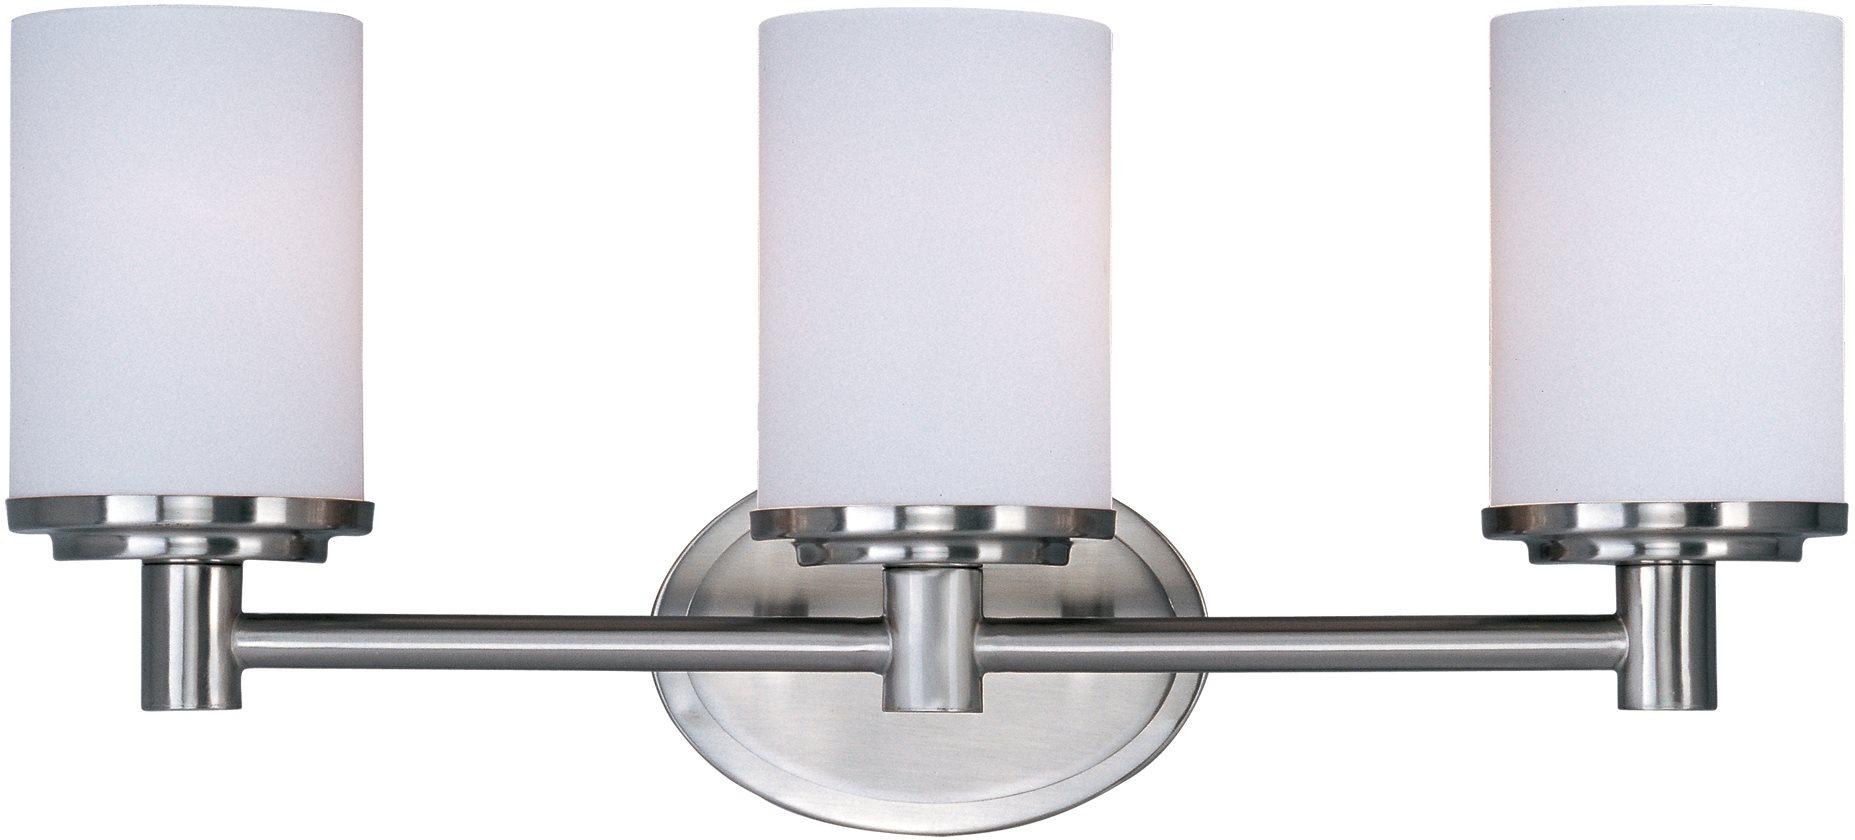 Maxim Lighting 9053swsn Cylinder Contemporary Bathroom